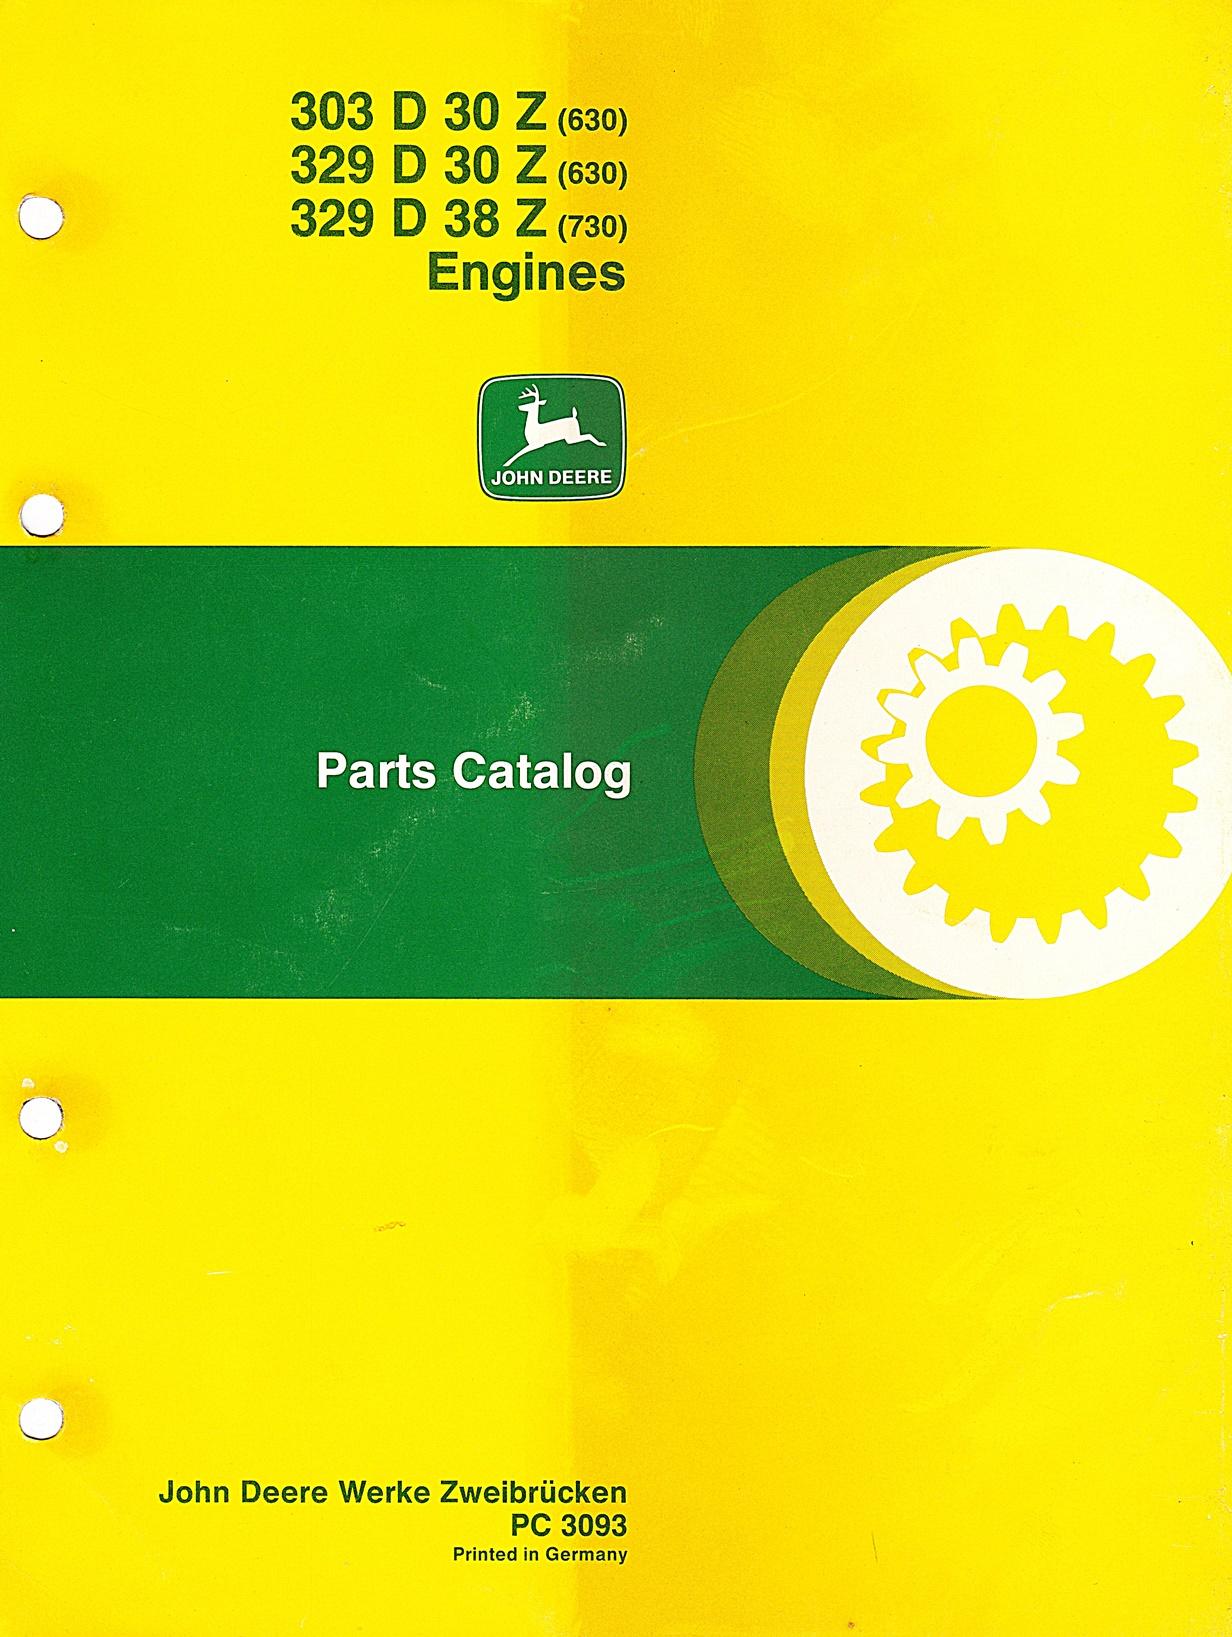 Ersatzteilkatalog John Deere Motoren 630 und 730